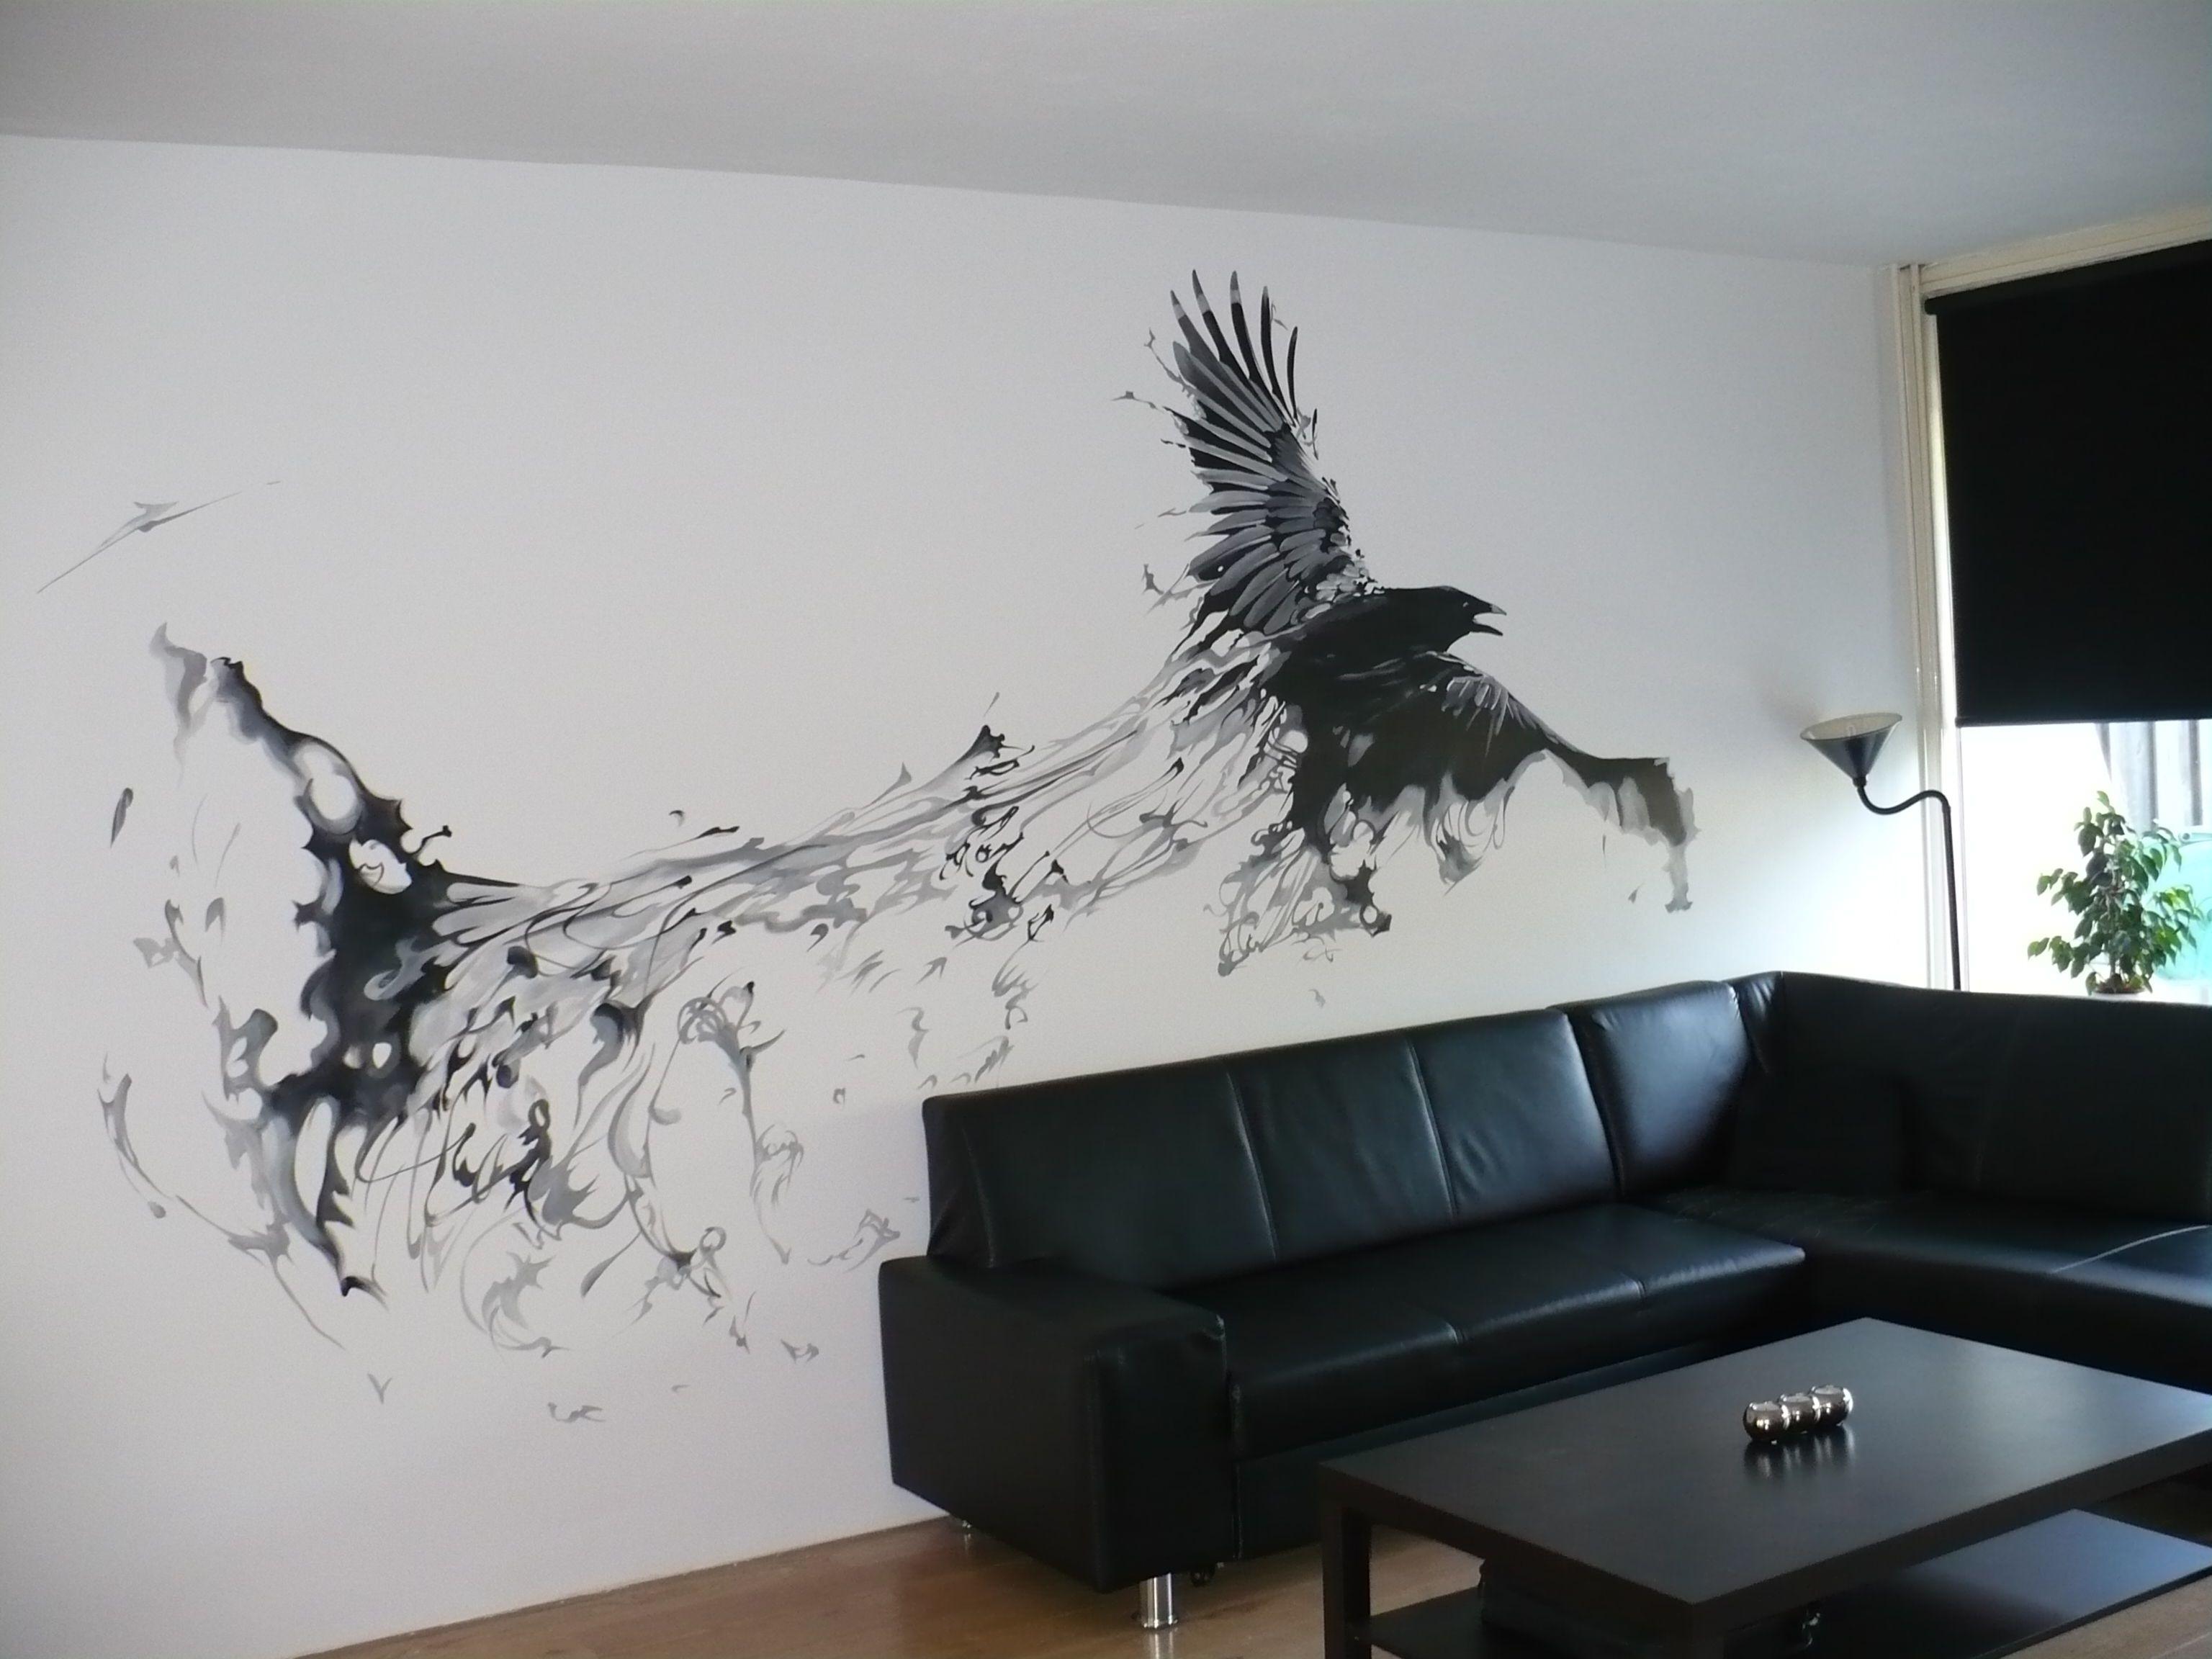 muurschildering kraai raaf woonkamer | muurschildering | Pinterest ...